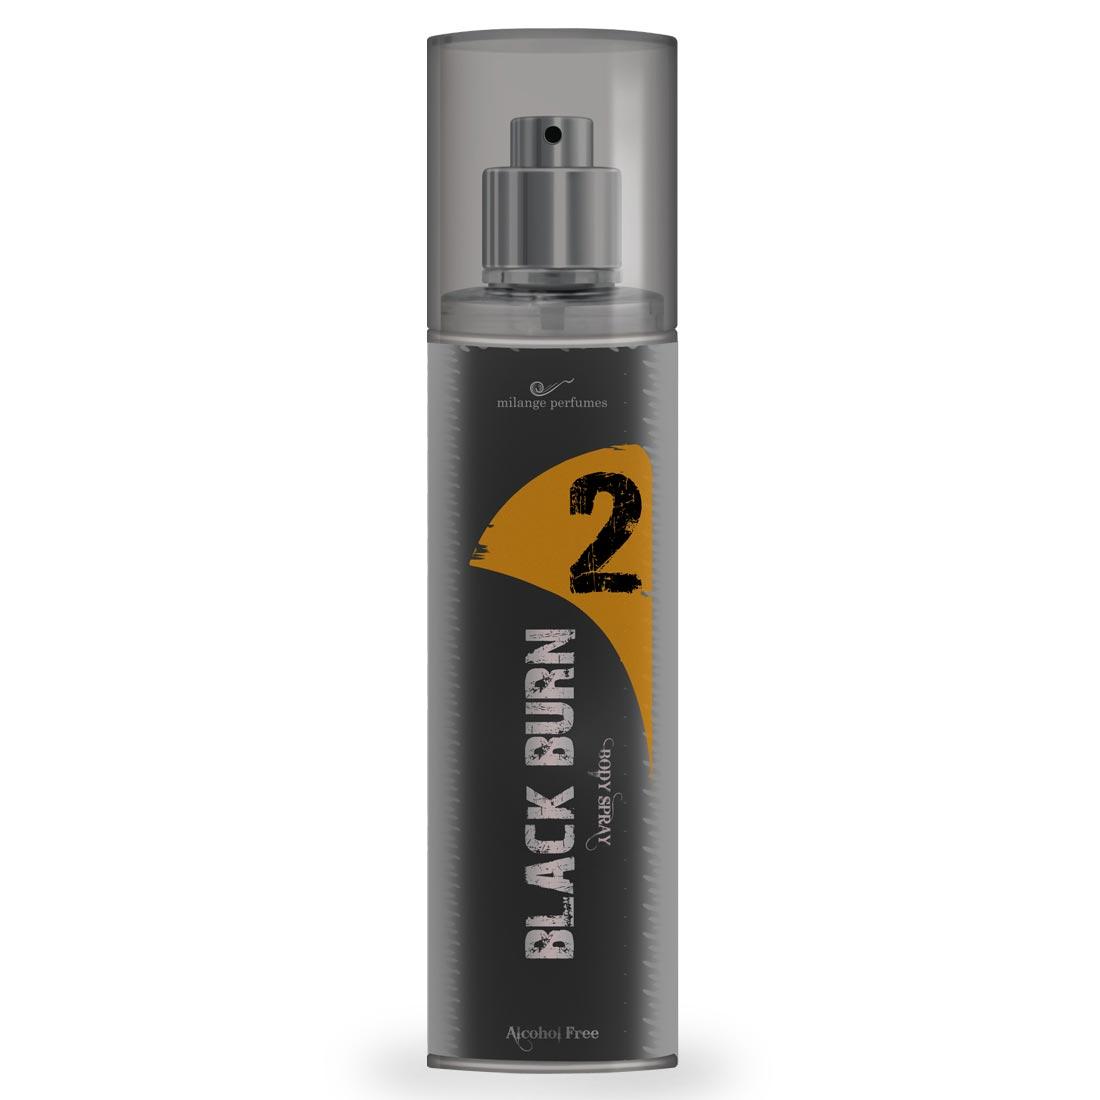 Black Burn No 2 Alcohol Free Body Deodorant